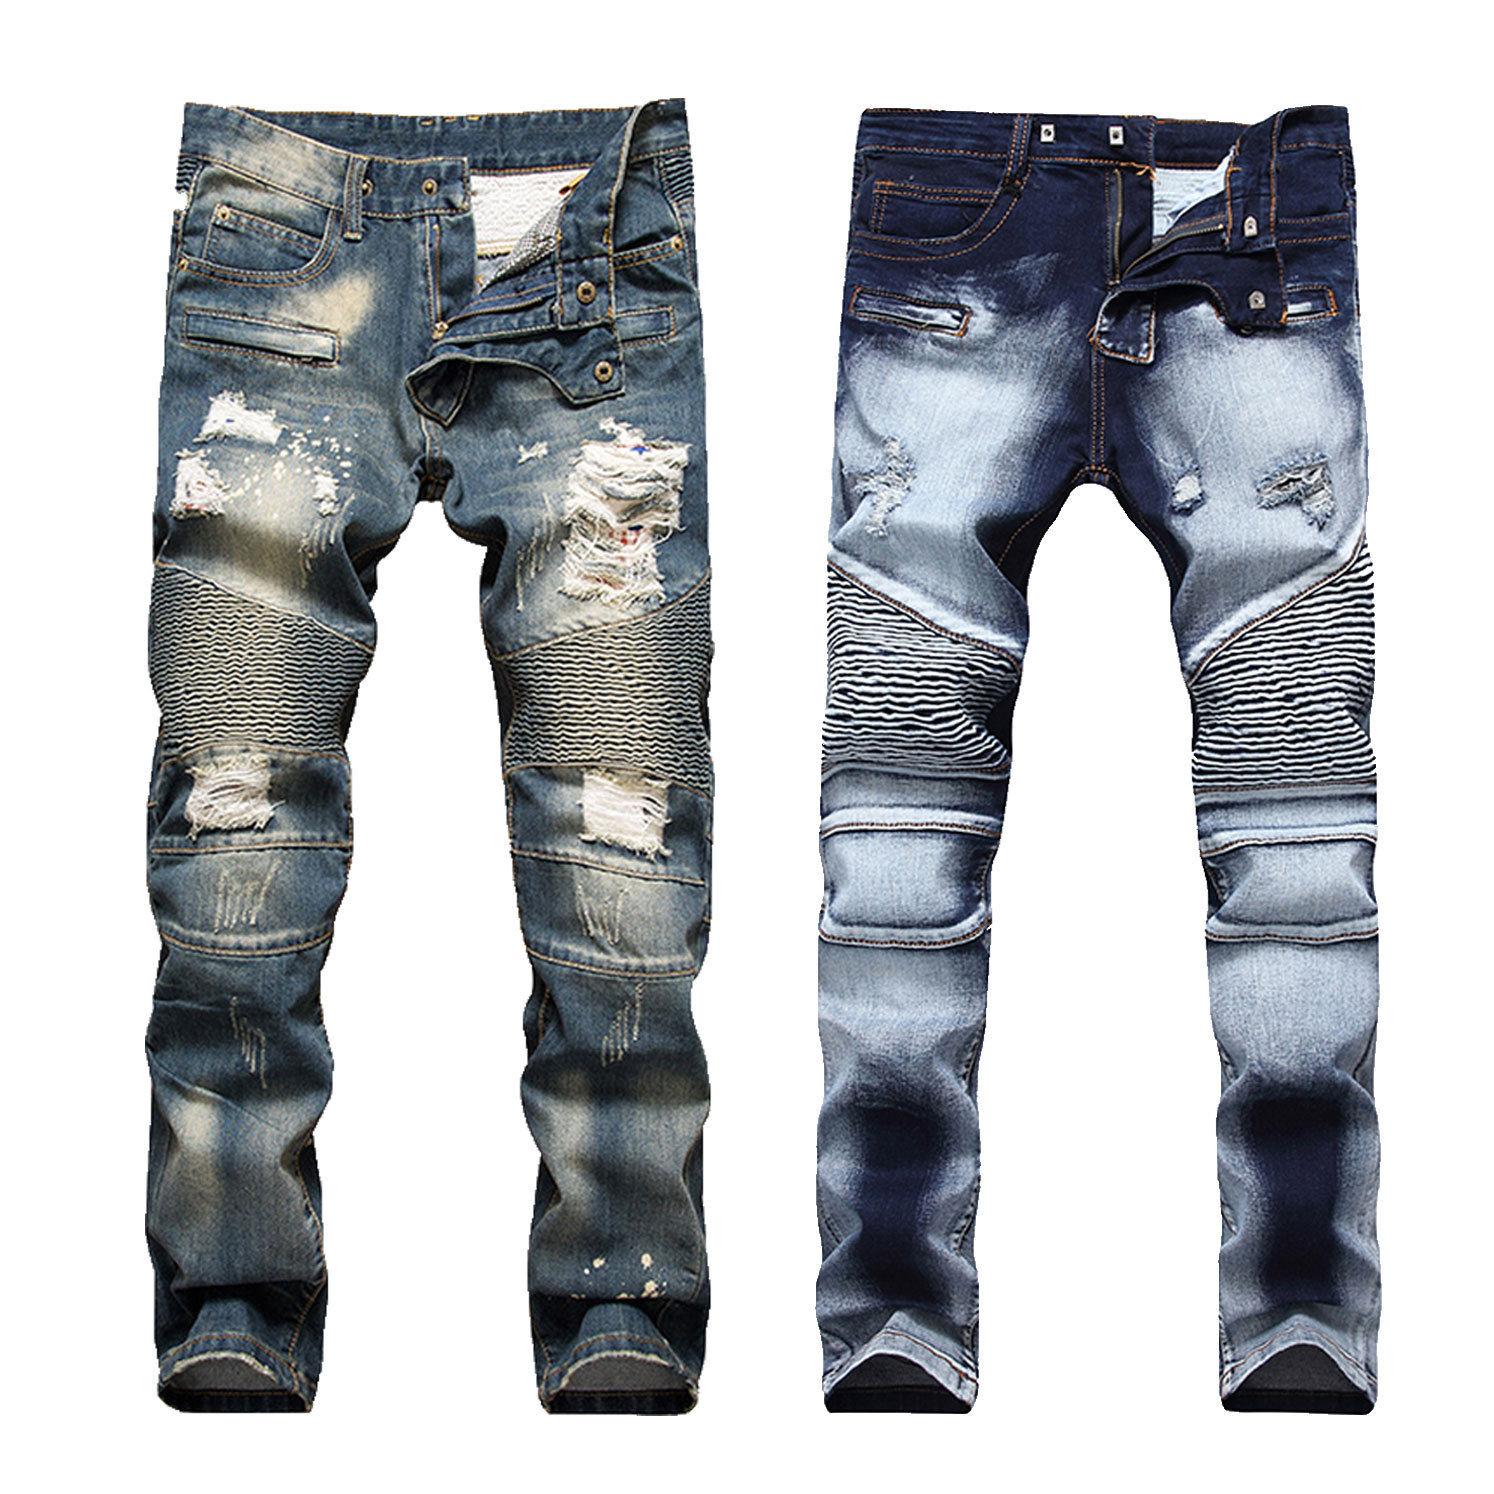 Only $18 - France Style Men Moto Biker Jeans Straight Slim Fit Denim Pants Distressed Blue